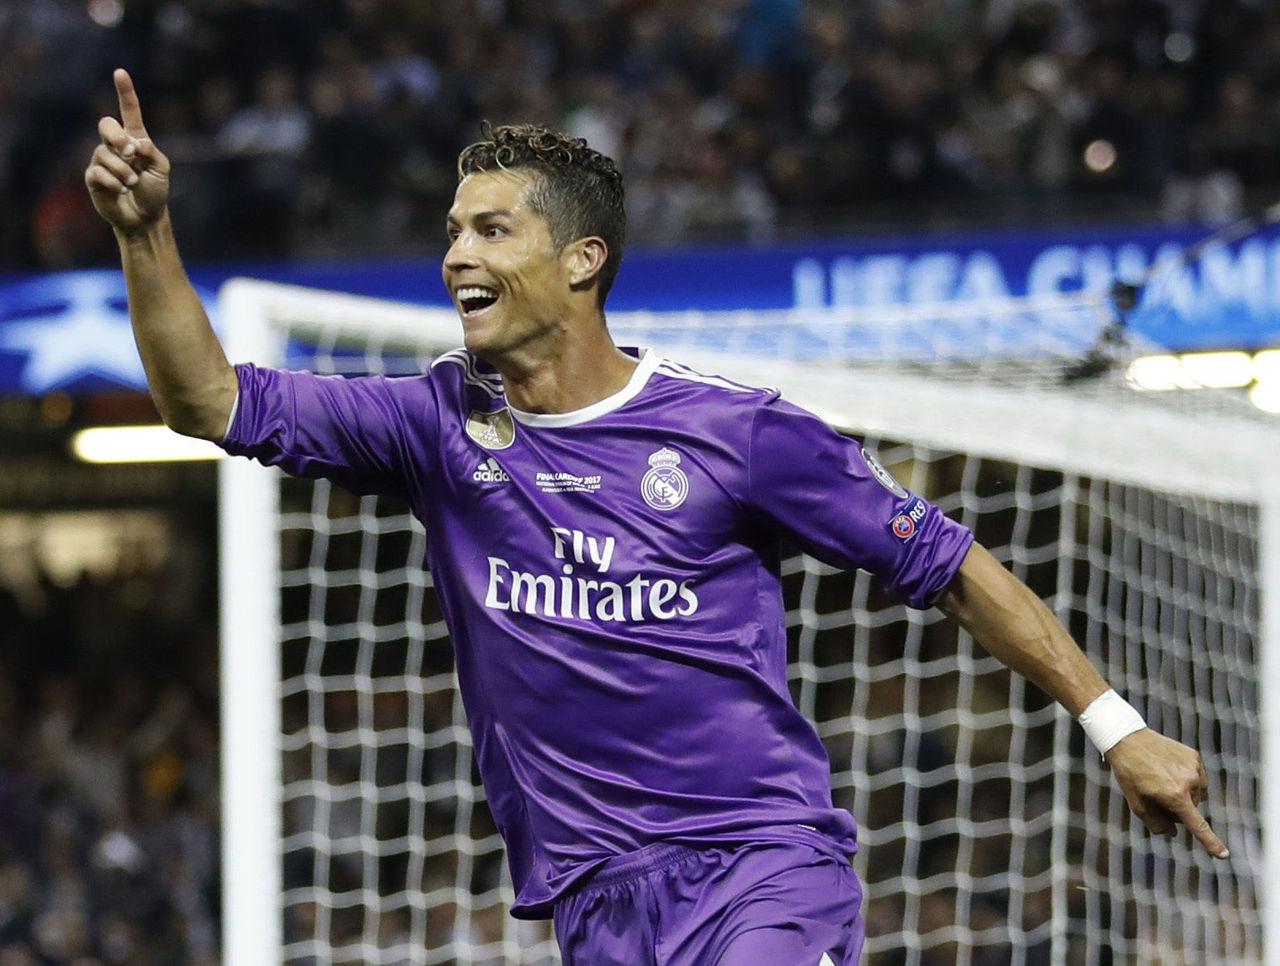 Cropped 2017 06 04t001536z 139536936 mt1aci14802072 rtrmadp 3 soccer champions final